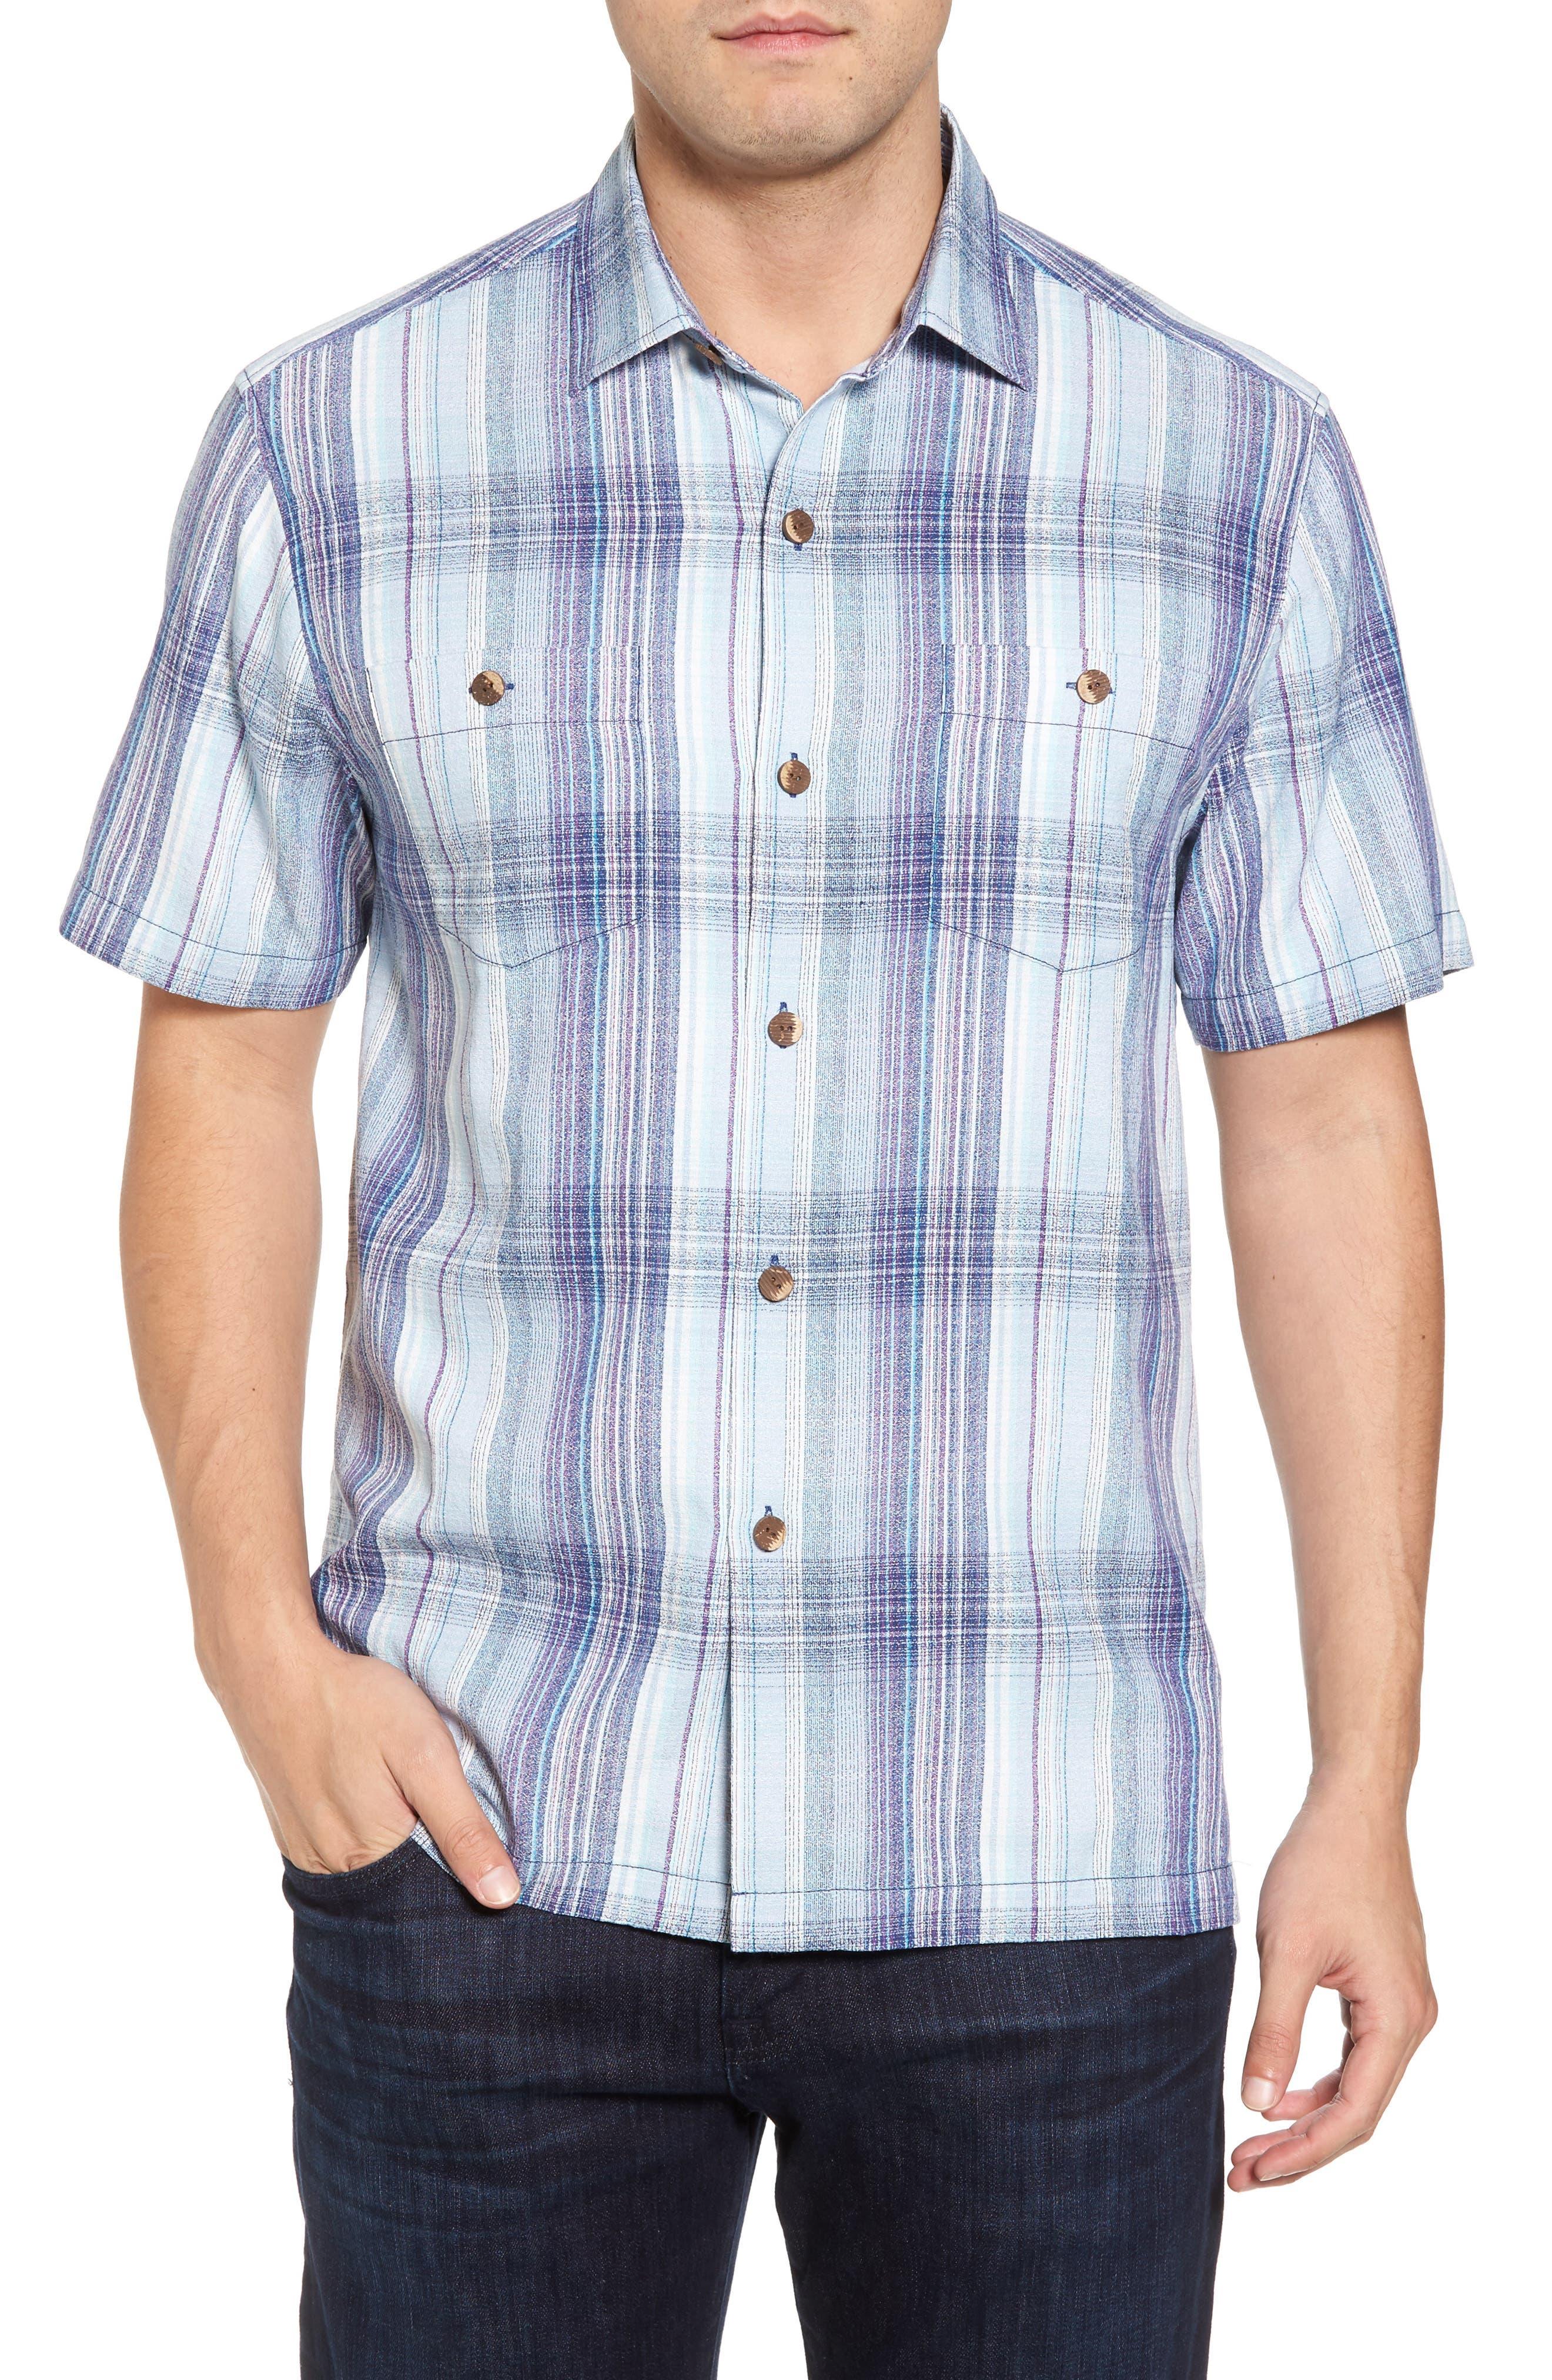 Banyan Cay Regular Fit Silk Blend Sport Shirt,                         Main,                         color, Dockside Blue